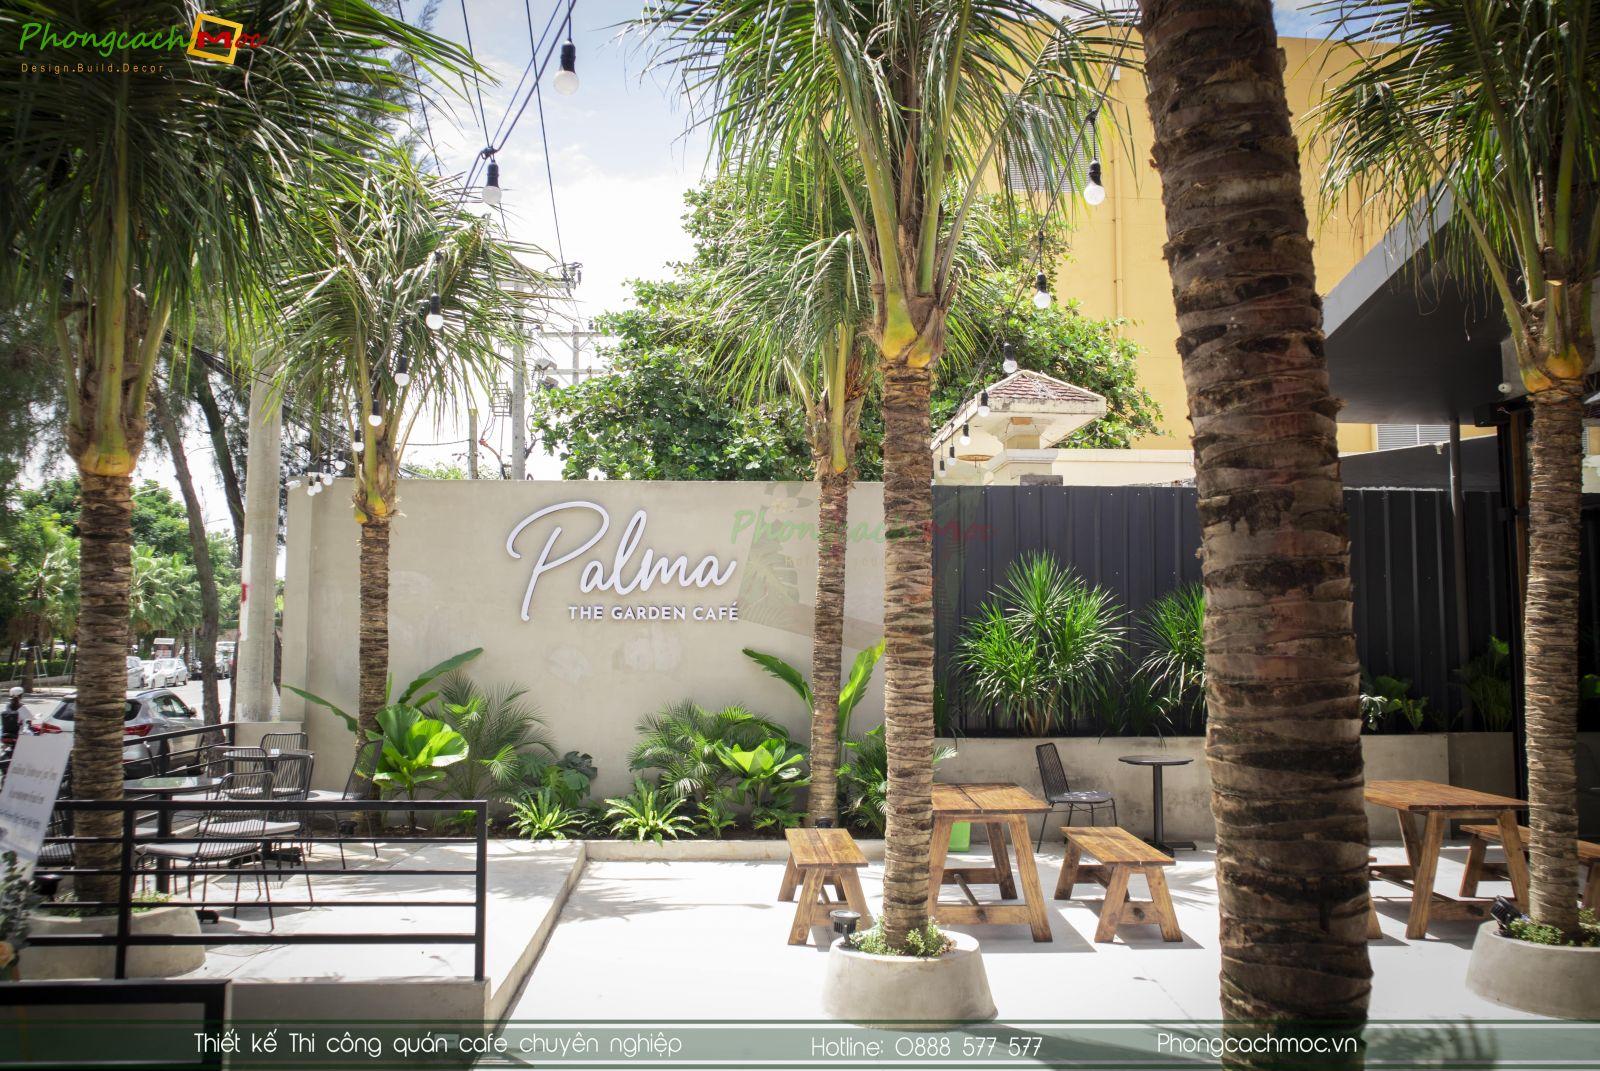 thi-cong-quan-cafe-palma-the-garden-cafe-vung-tau-11